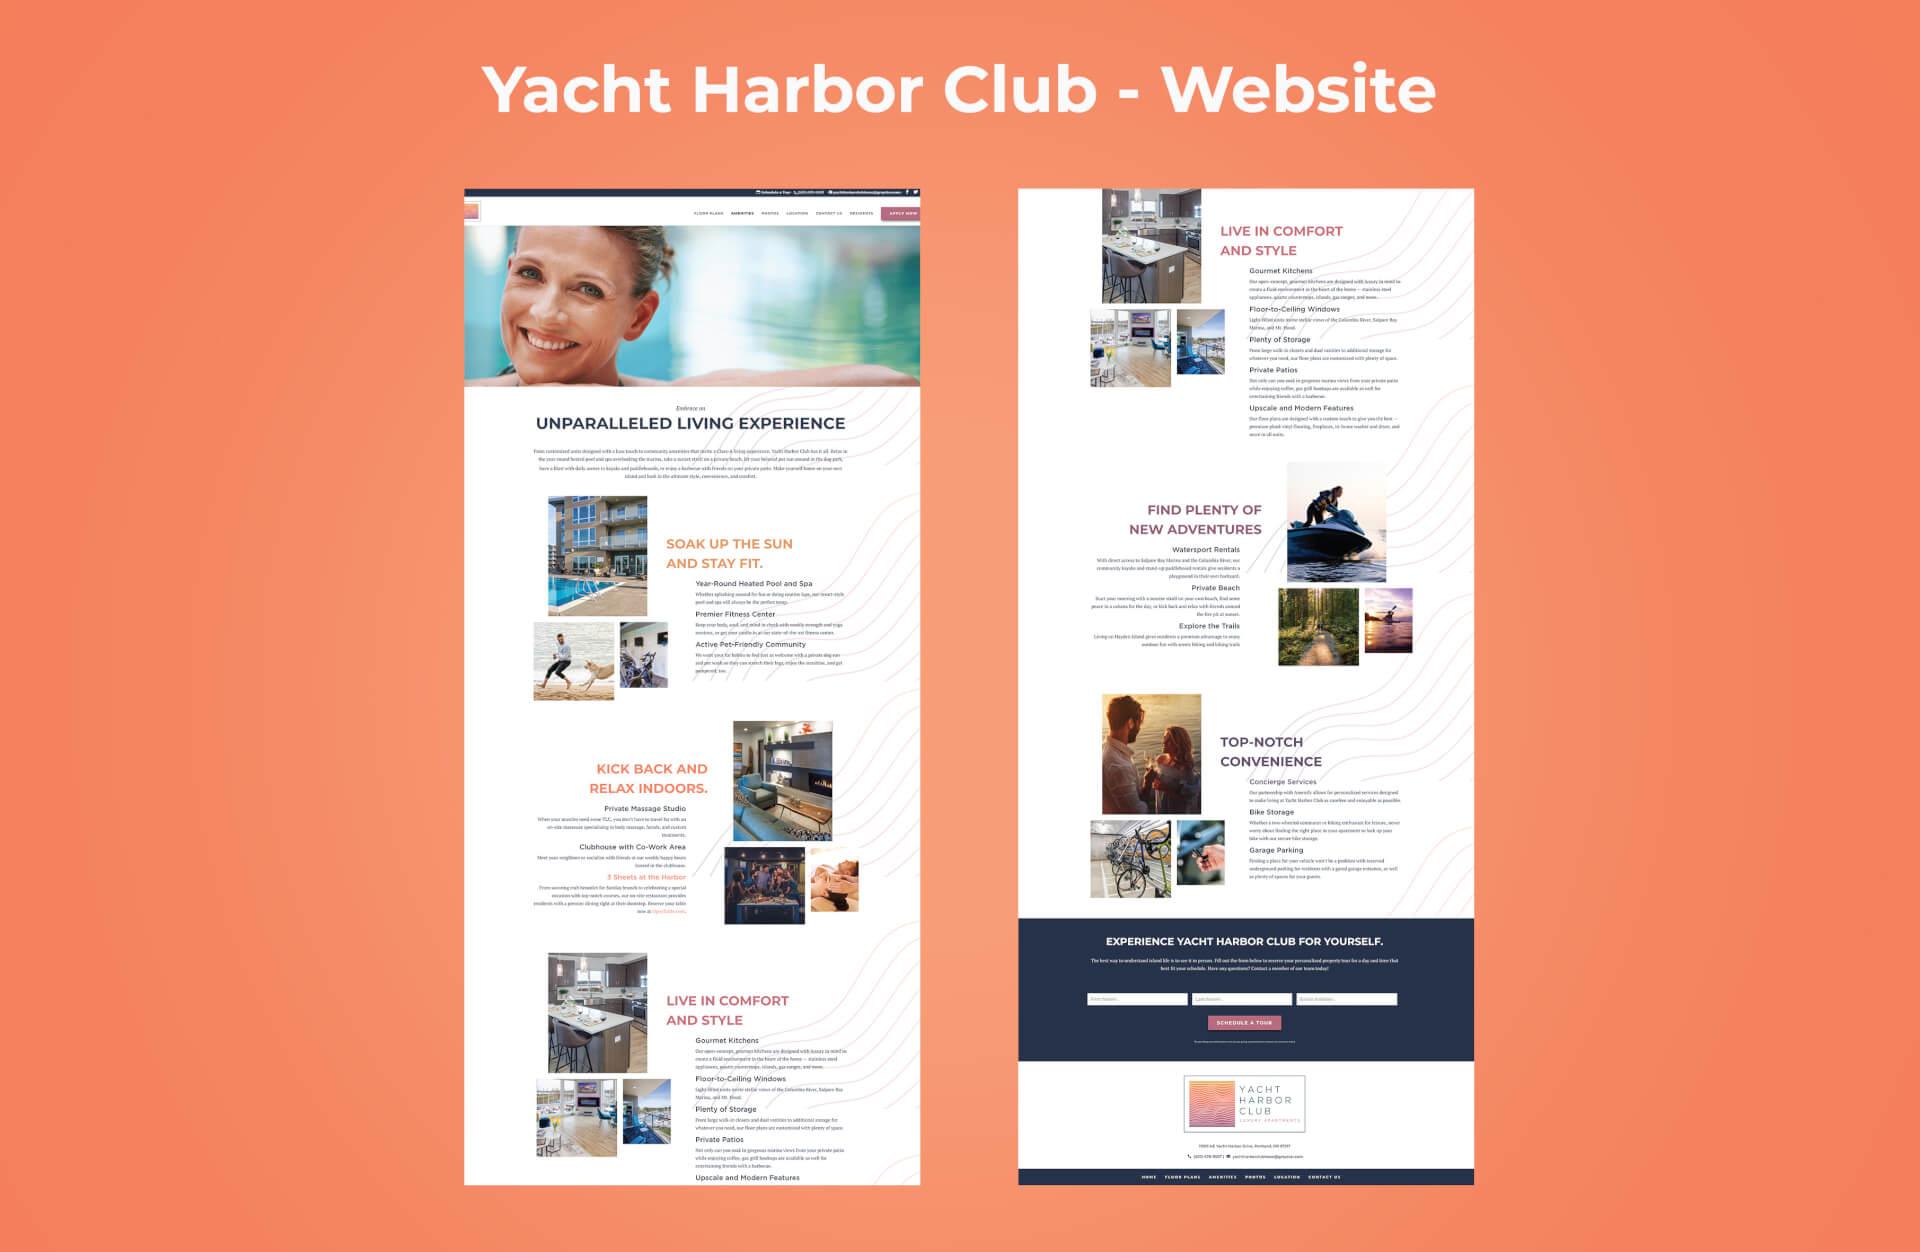 Homepage of Yacht Harbor Club's Website